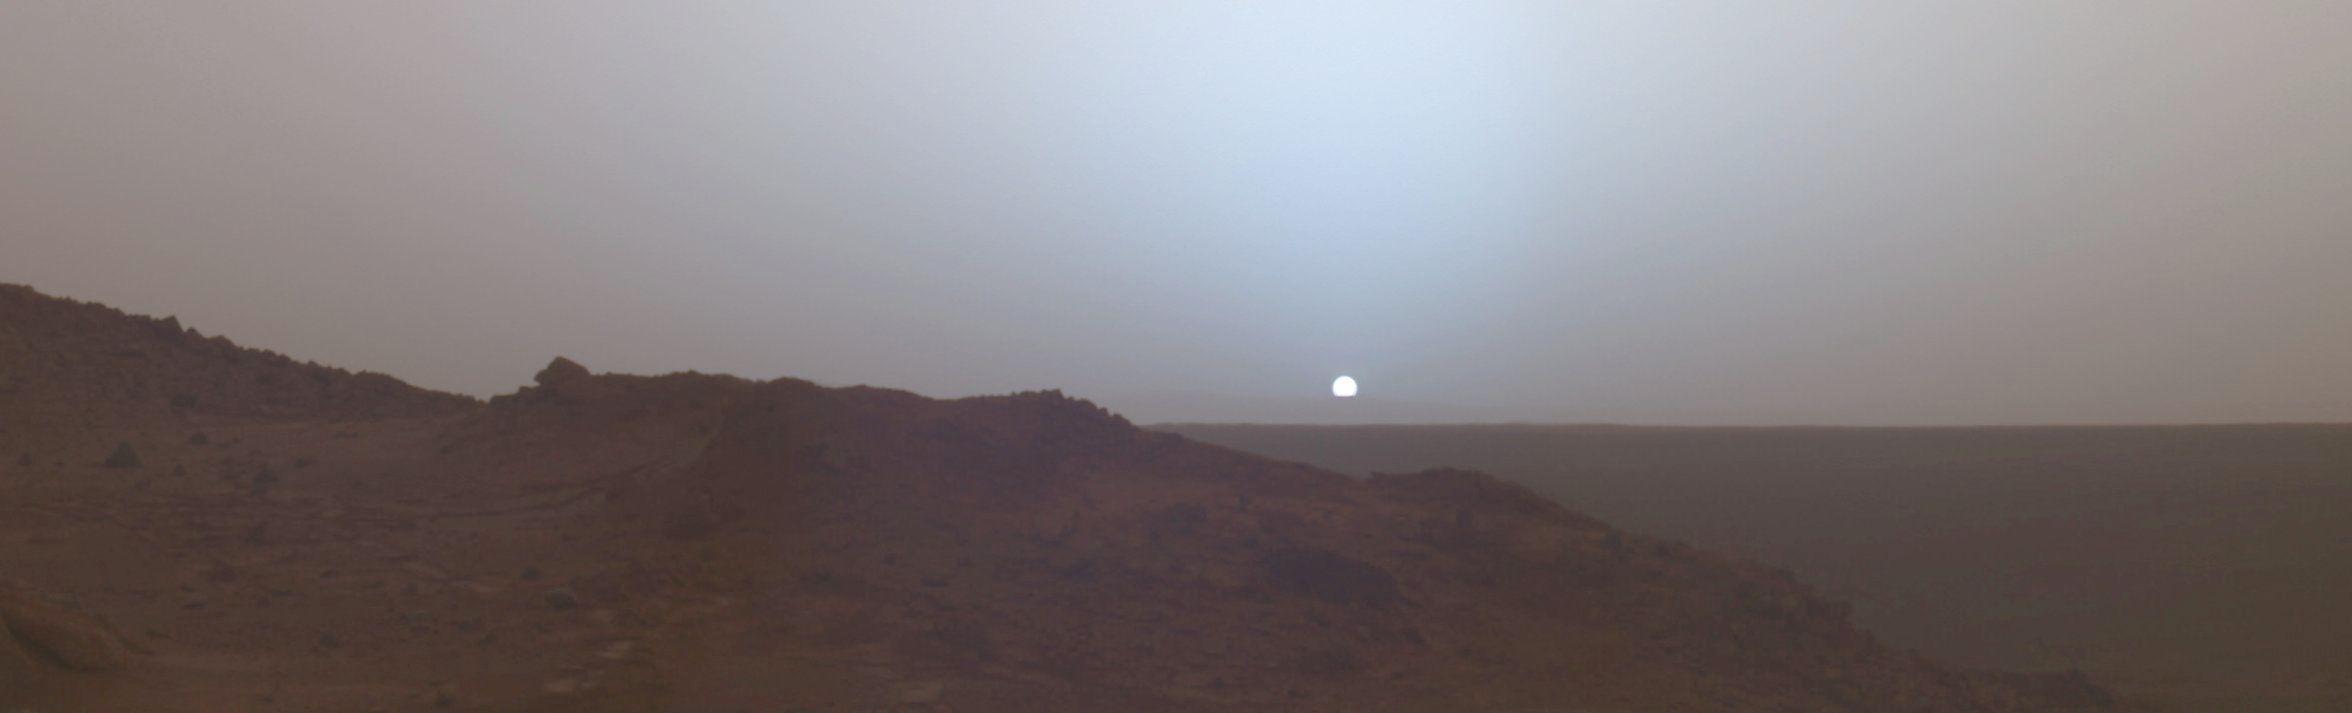 Закат на Марсе — как это выглядит? - 1